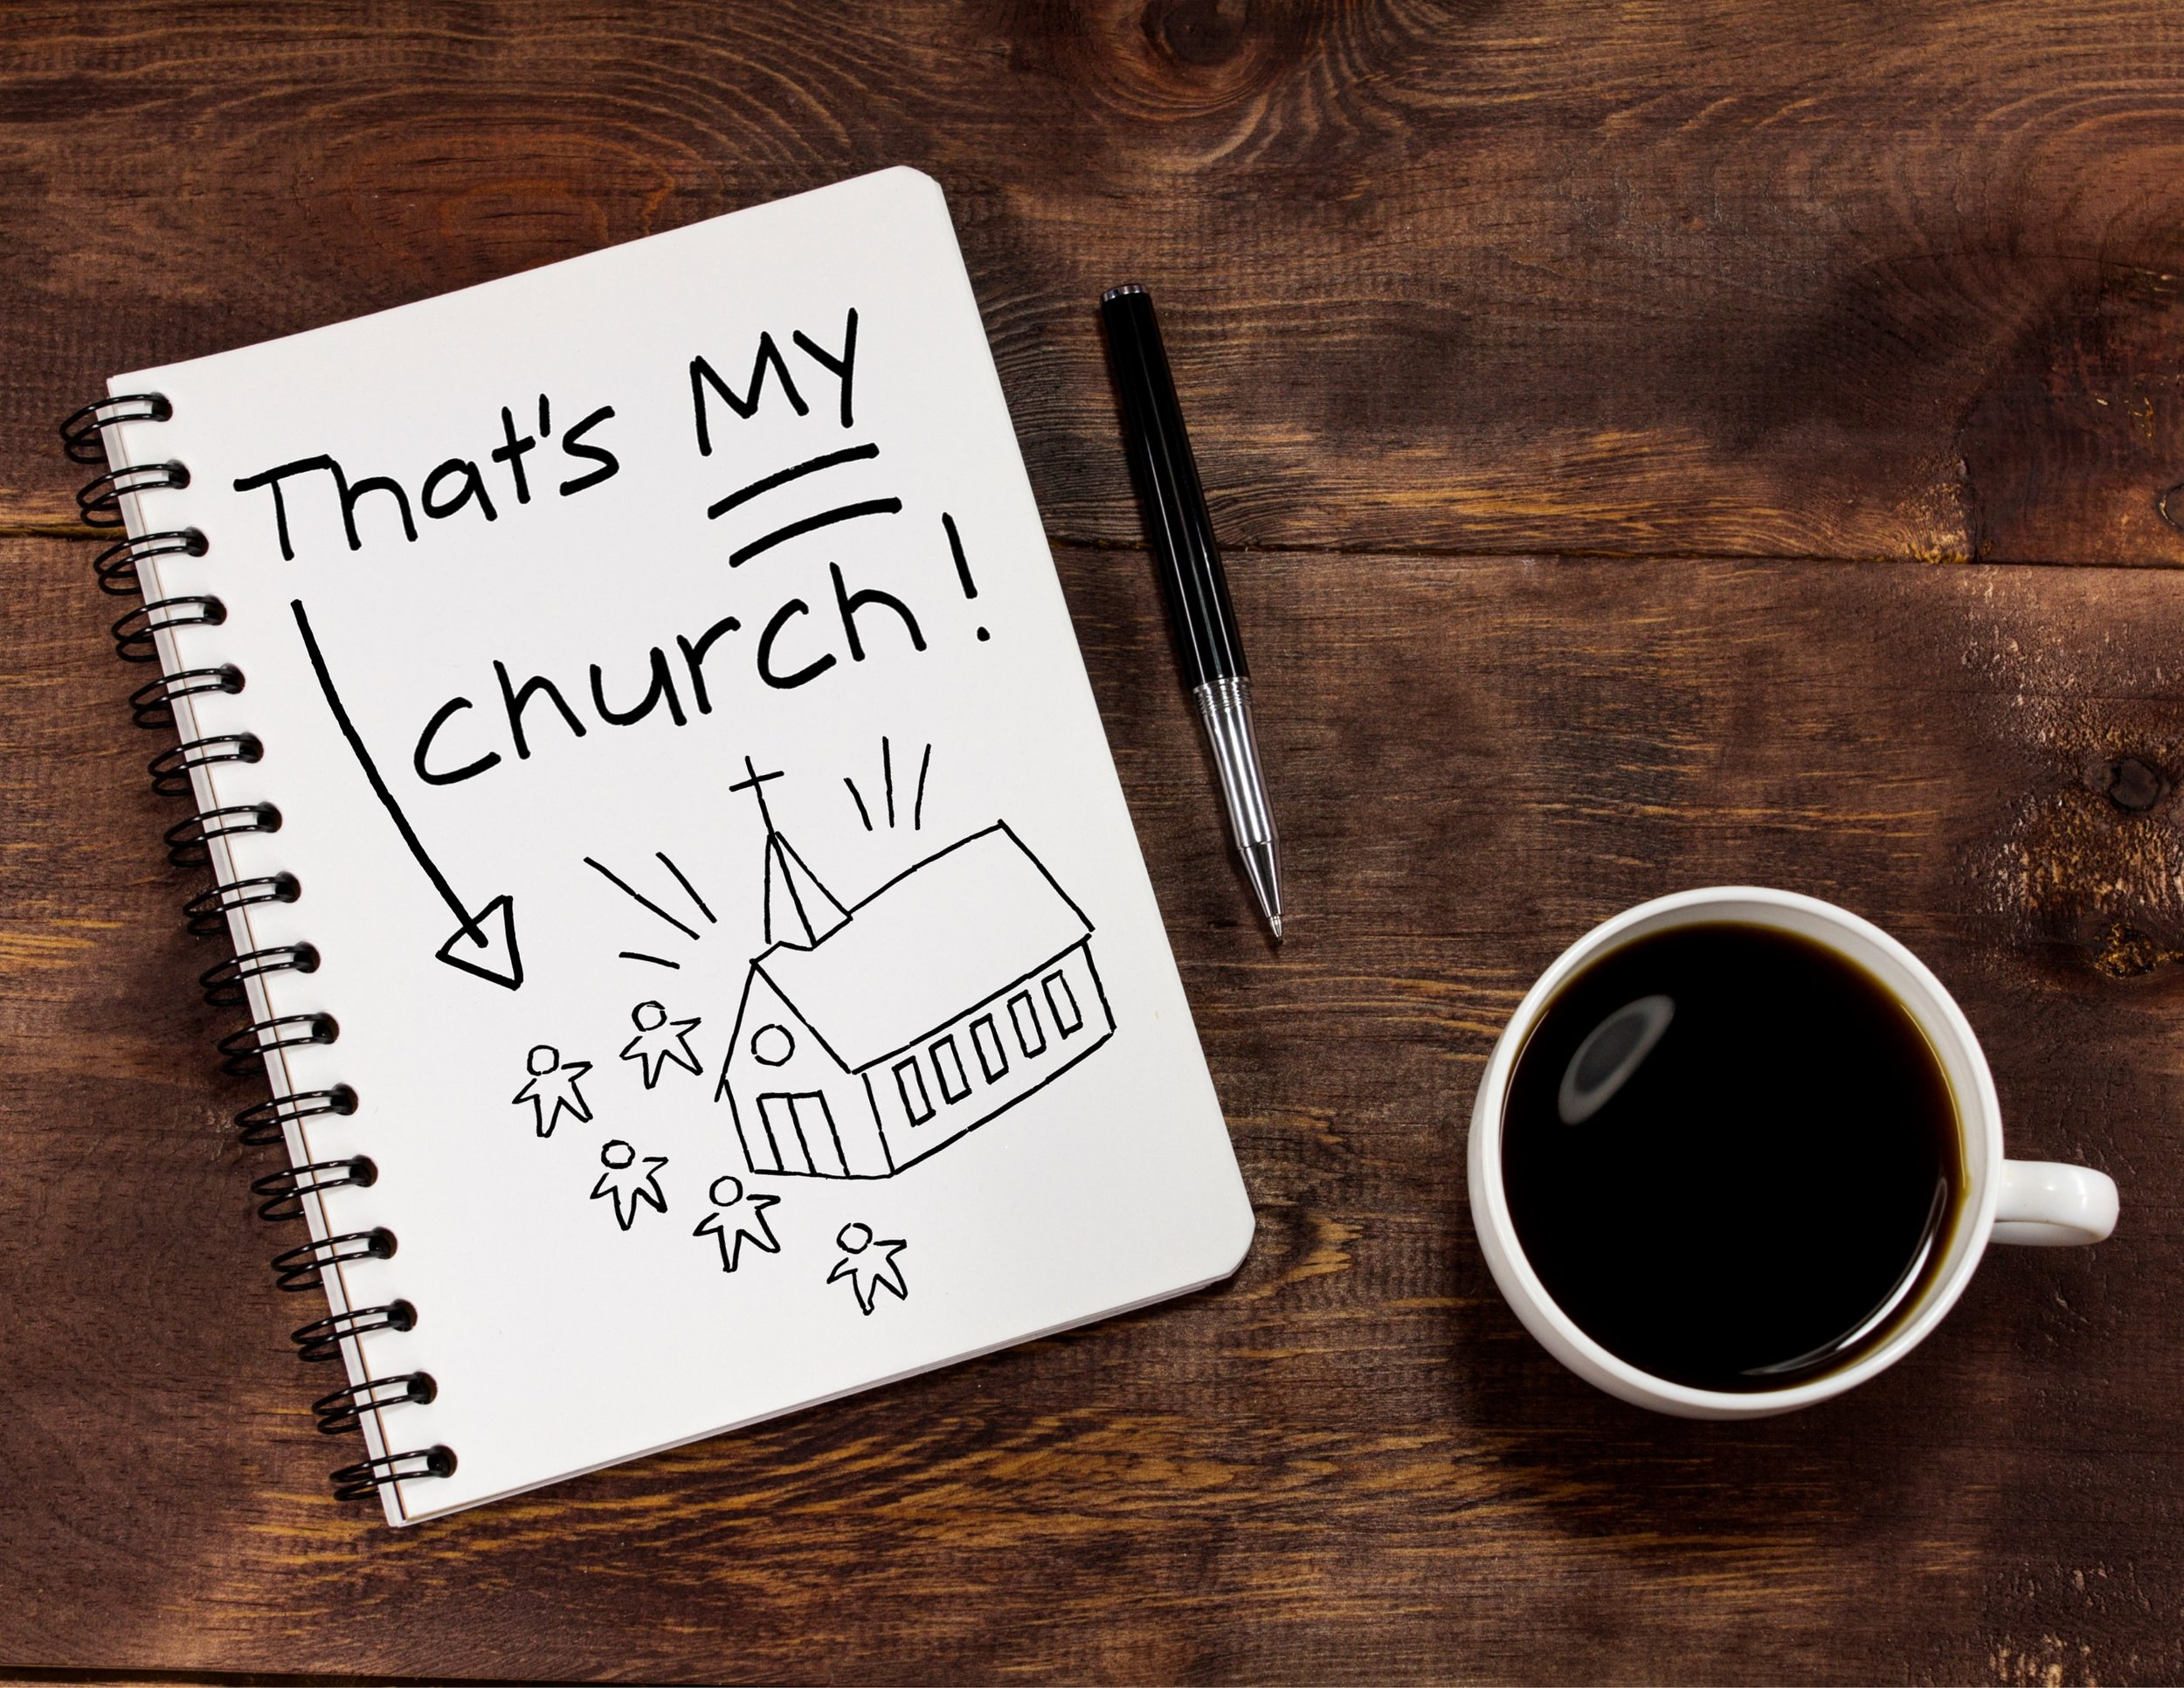 April 23, 2017 ~ A Culture of Discipleship - Part 1 (Mark 8:27-38) ~ Pastor Jason Pilchard